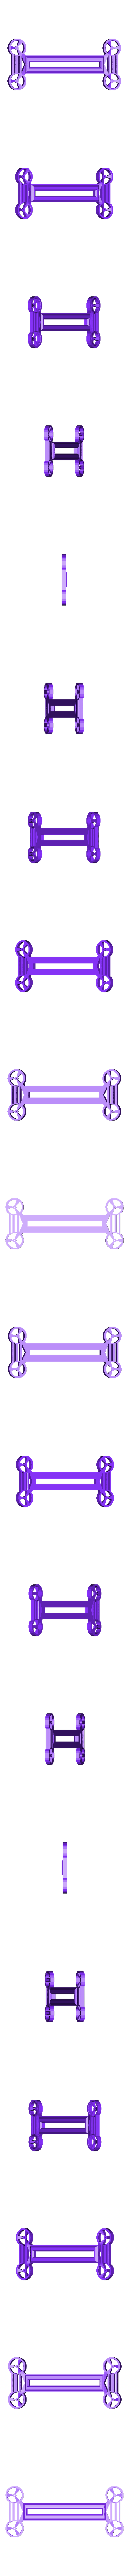 tubekey_05_slicr.stl Download free STL file Ducted big tube key • Model to 3D print, noctaro